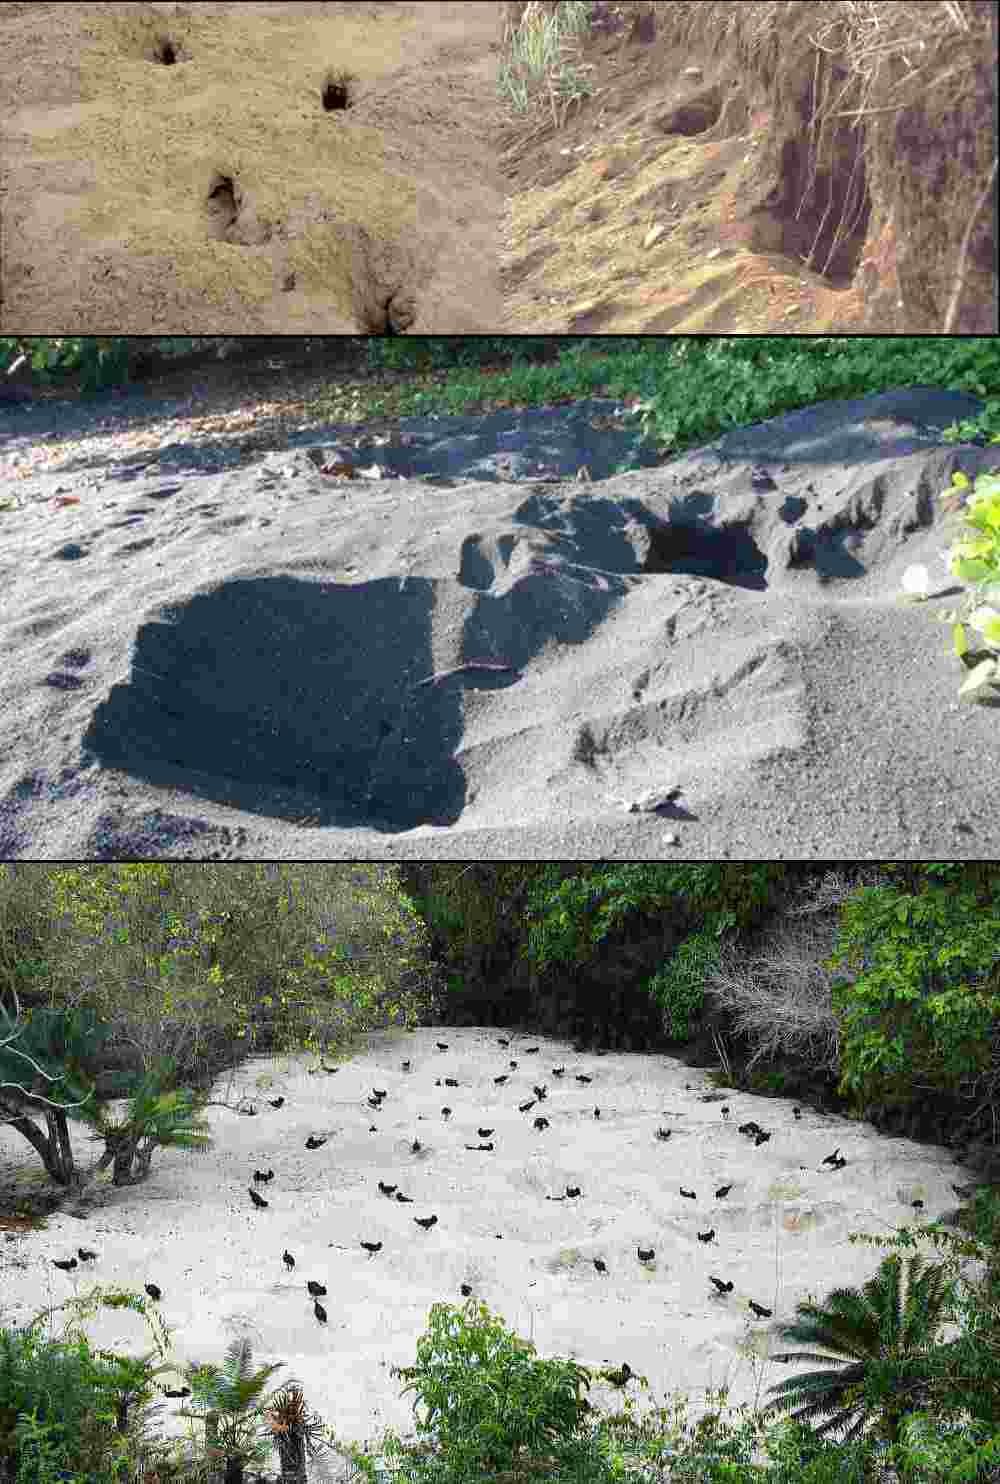 sandy nesting  sites.jpg